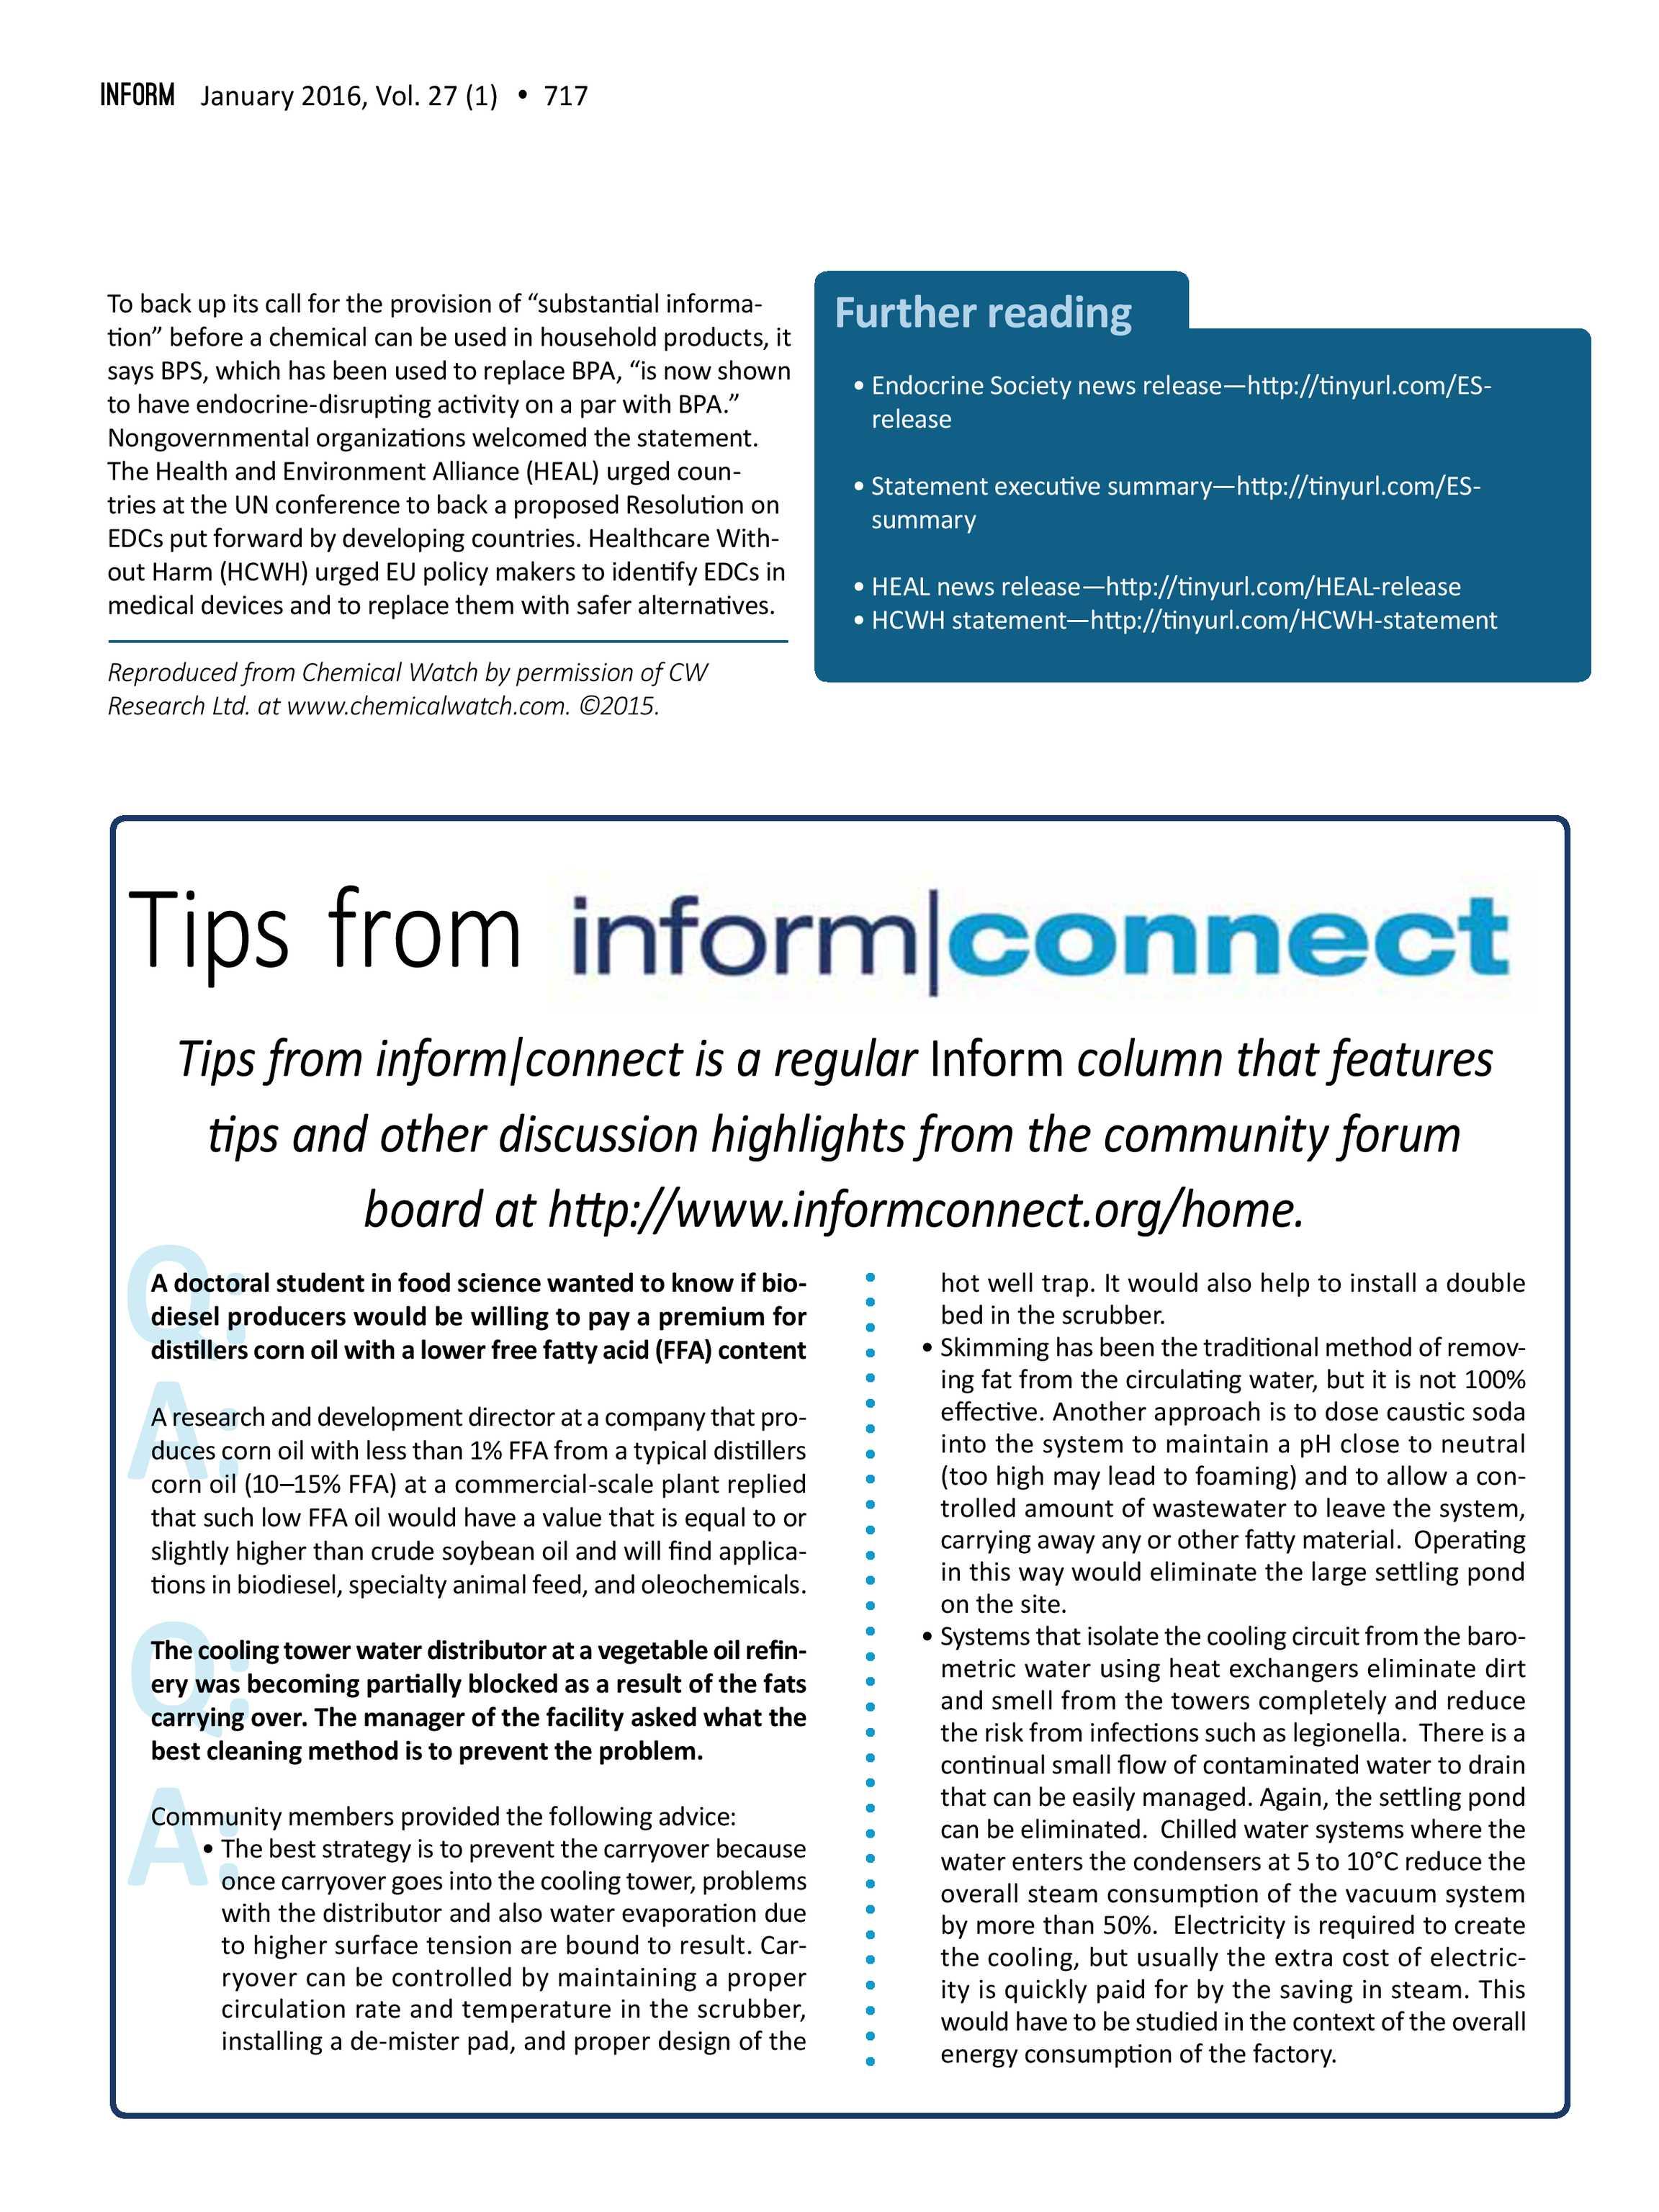 Inform Magazine - January 2016 - page 717